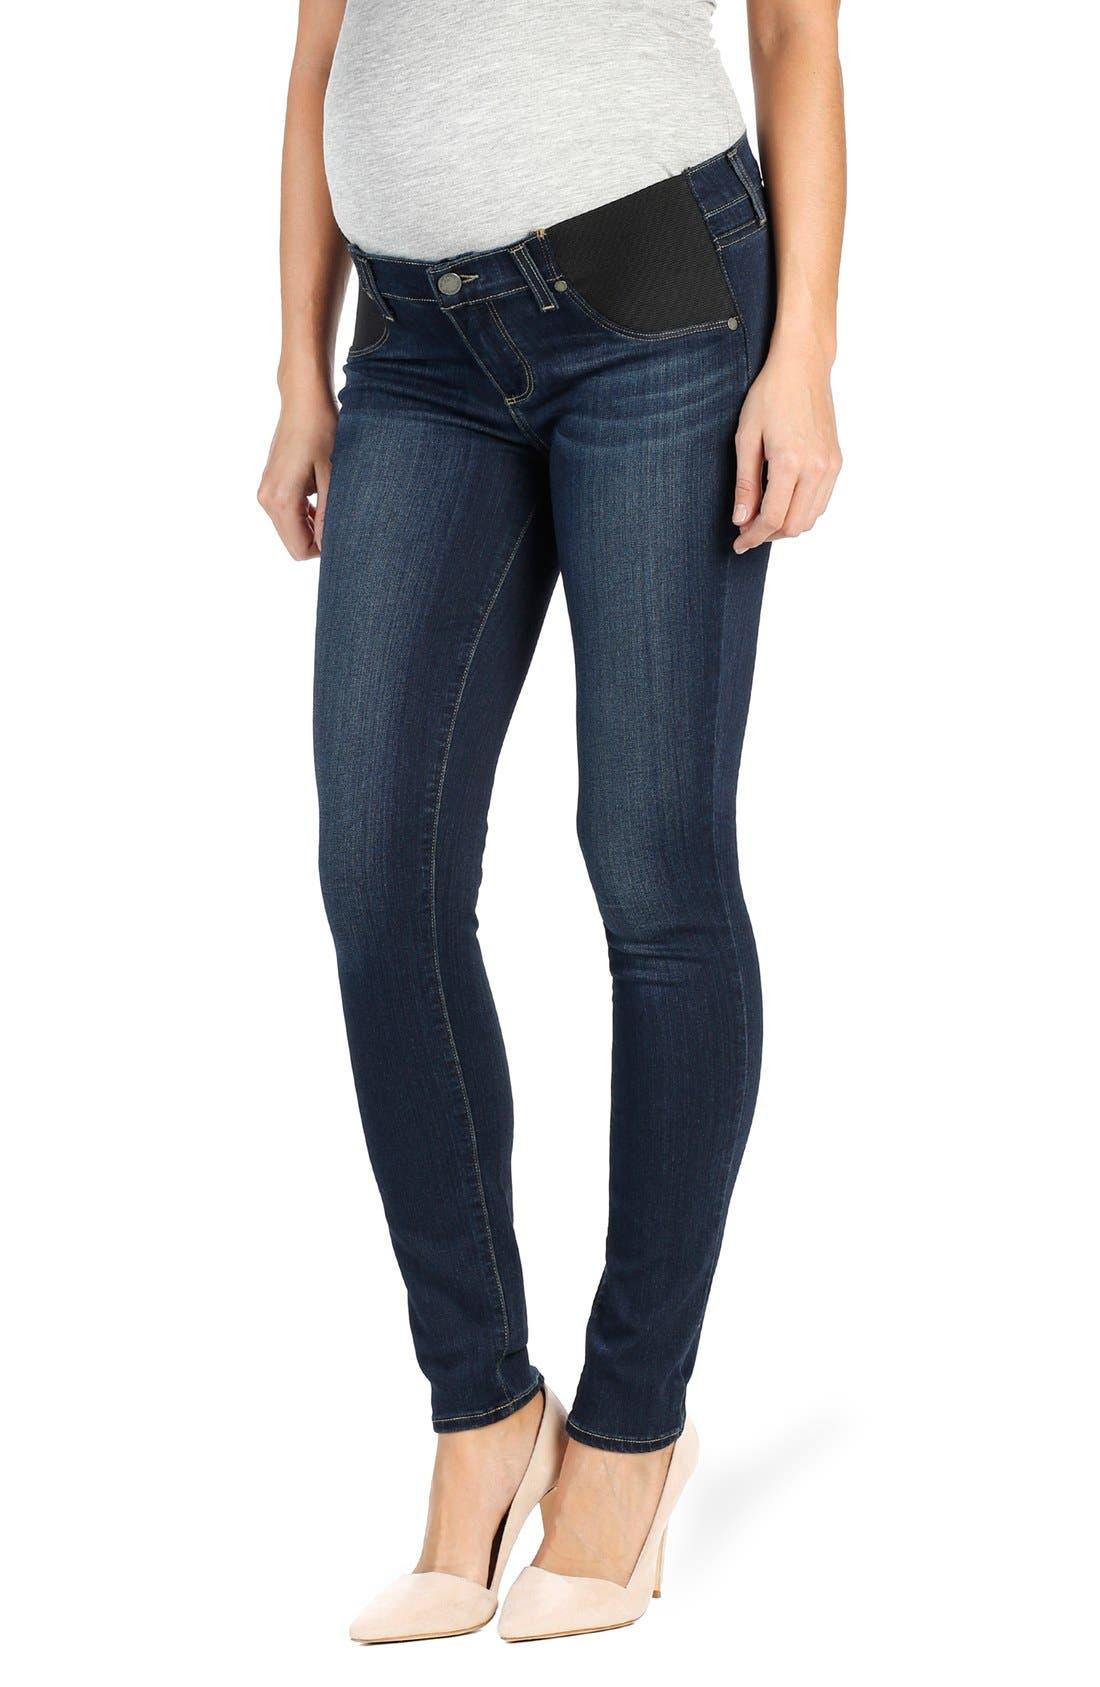 Women's Paige 'Transcend - Verdugo' Ultra Skinny Maternity Jeans